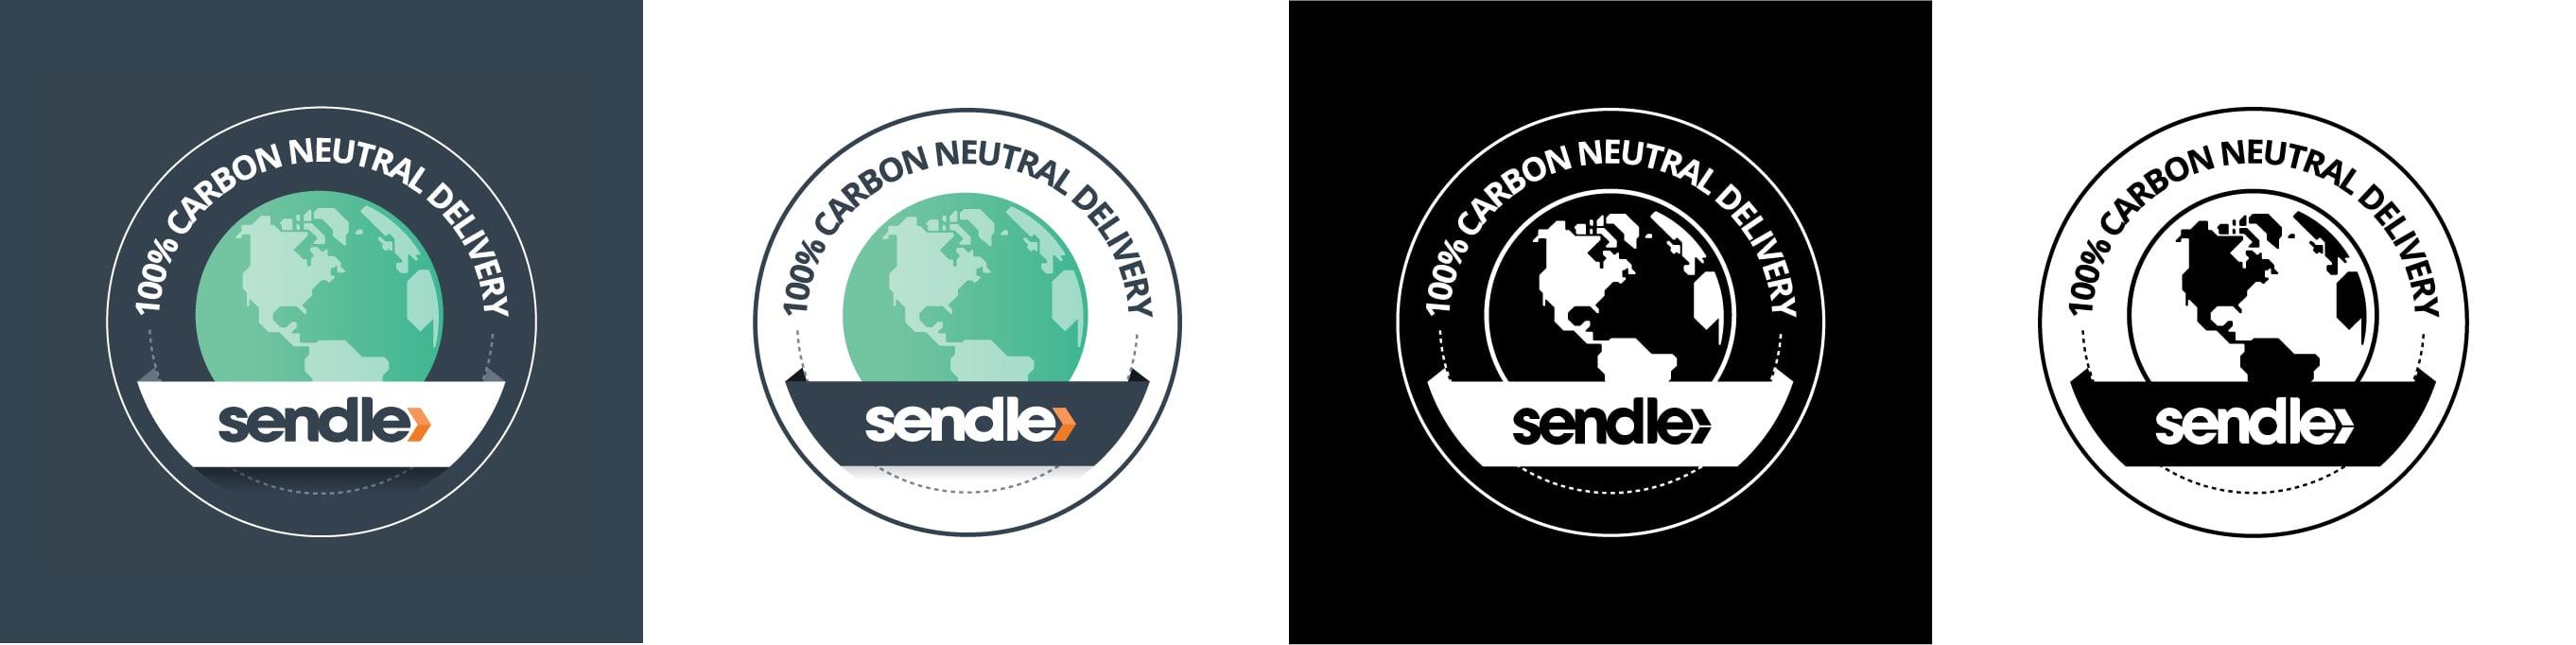 sendle-carbon-neutral-logos-all-US@2x